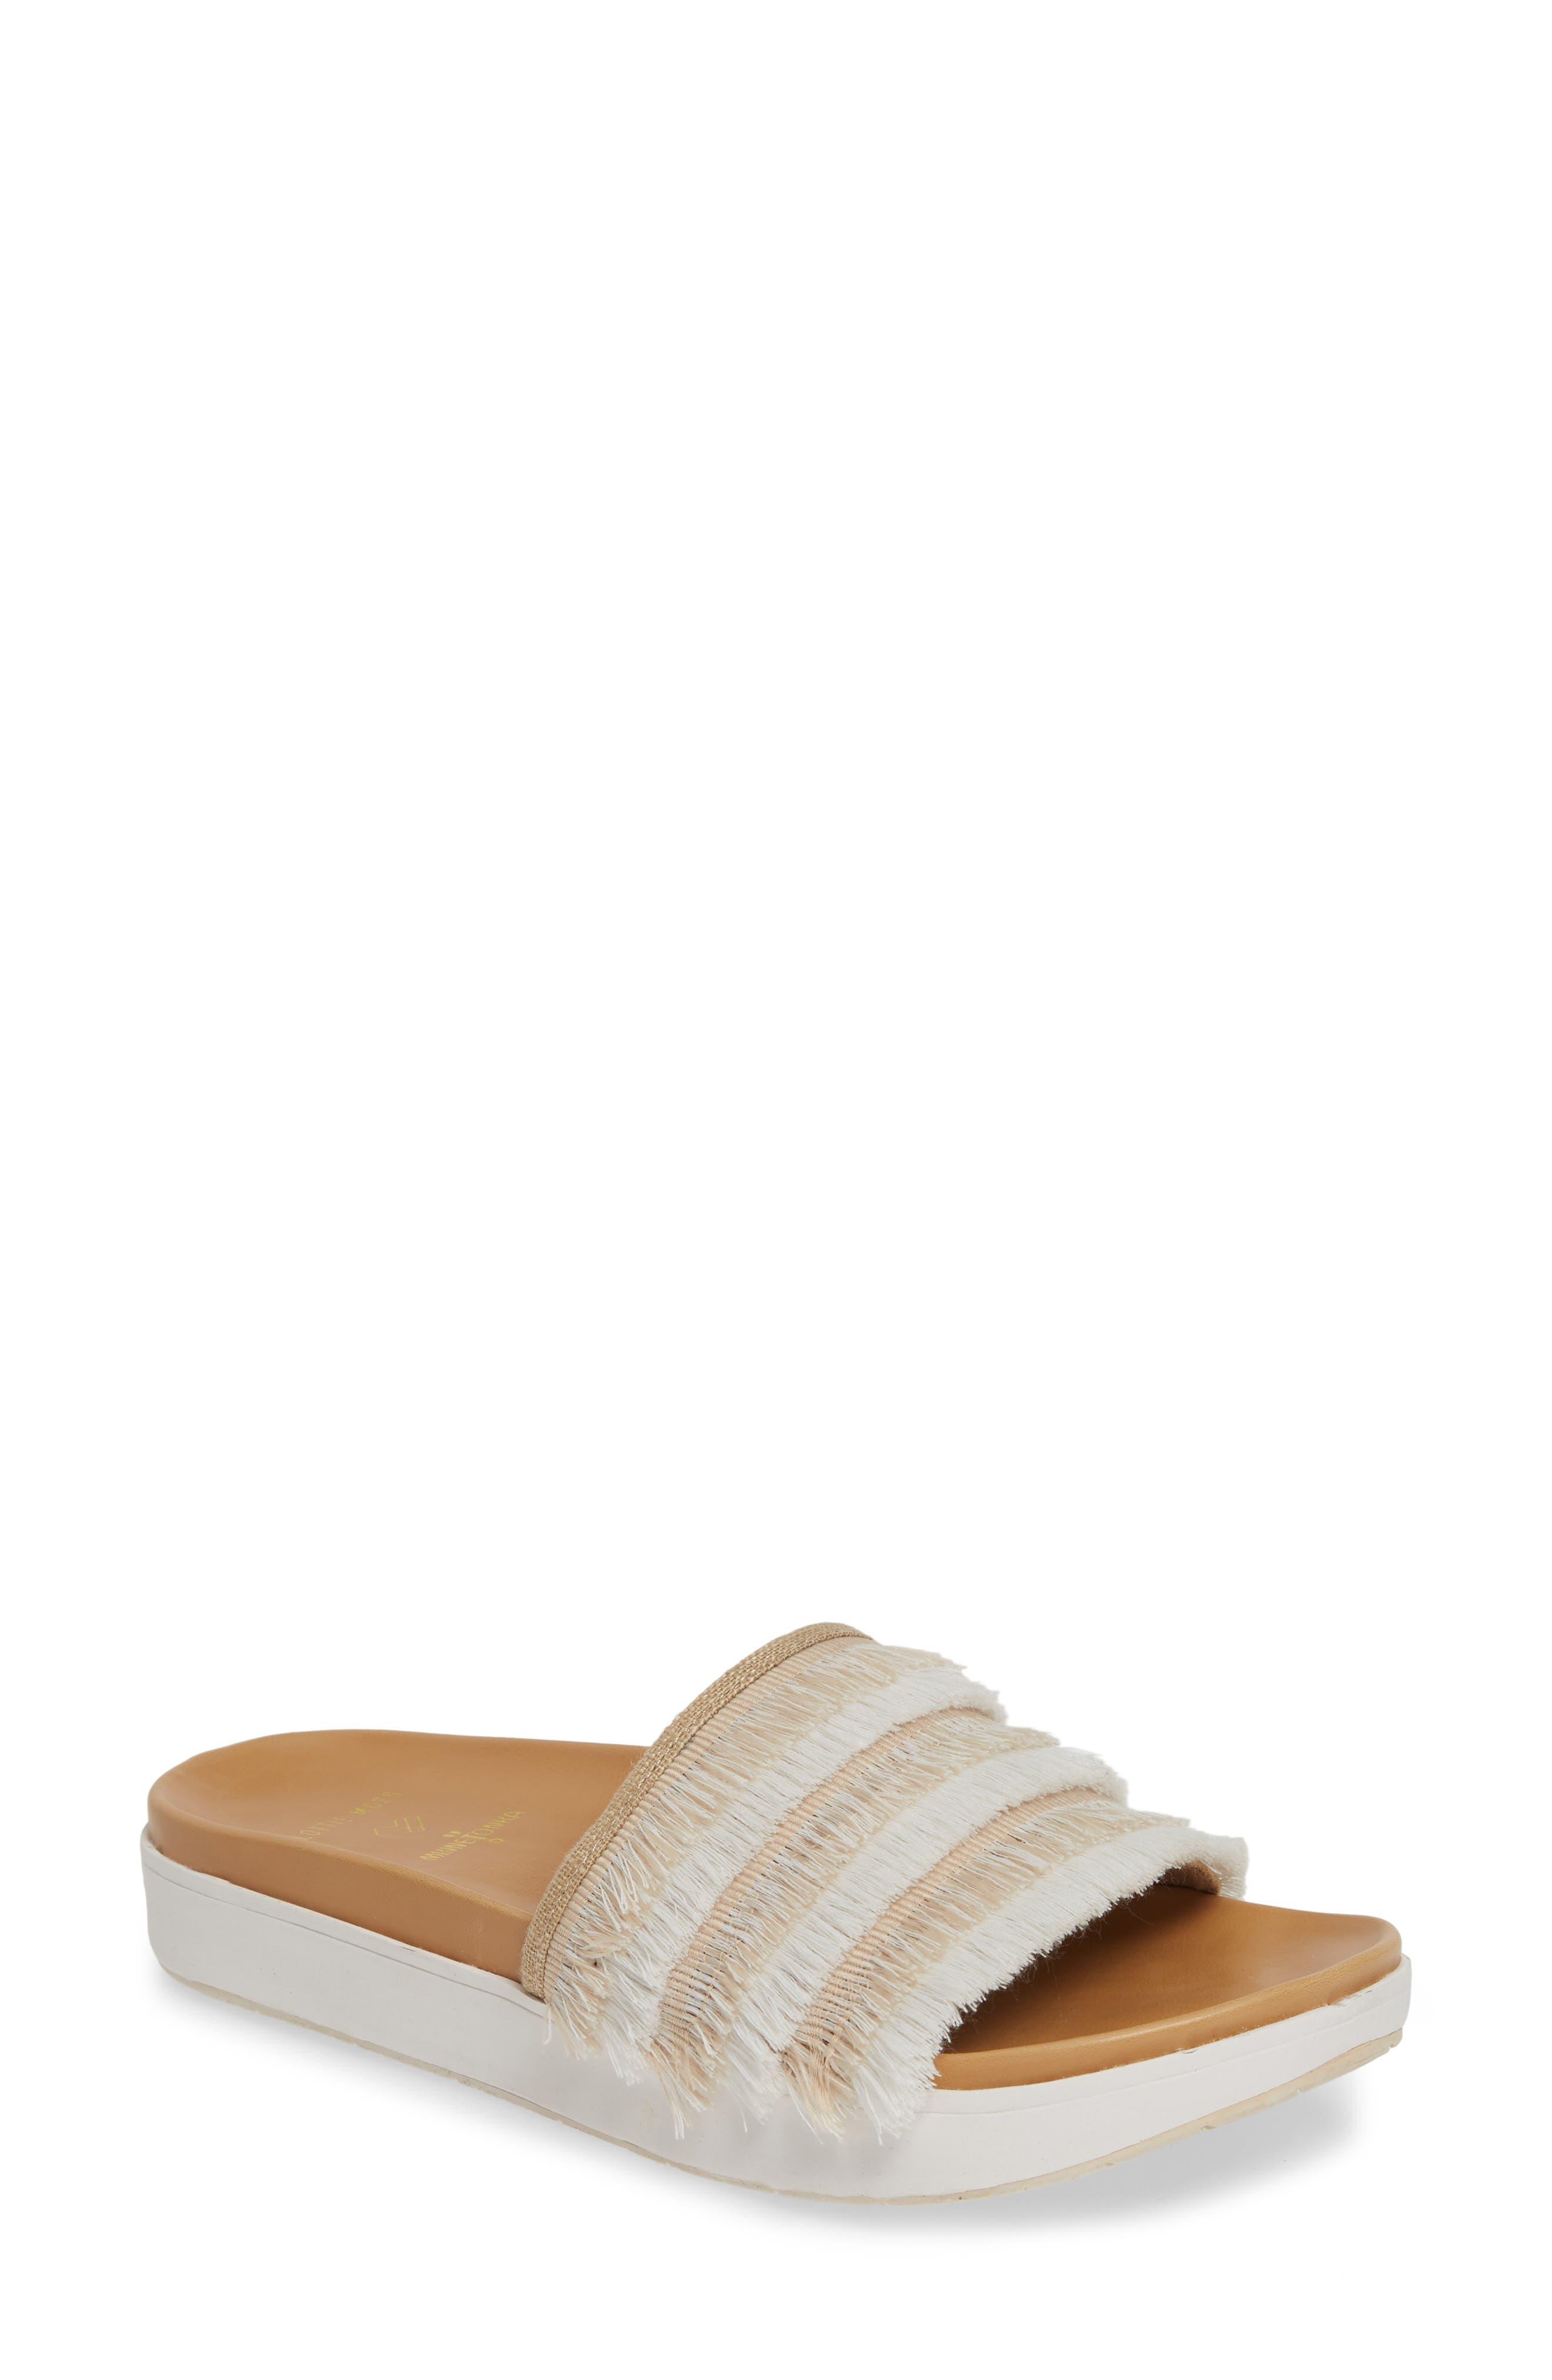 MINNETONKA x Lottie Moss Ashlynn Fringe Slide Sandal, Main, color, TAUPE